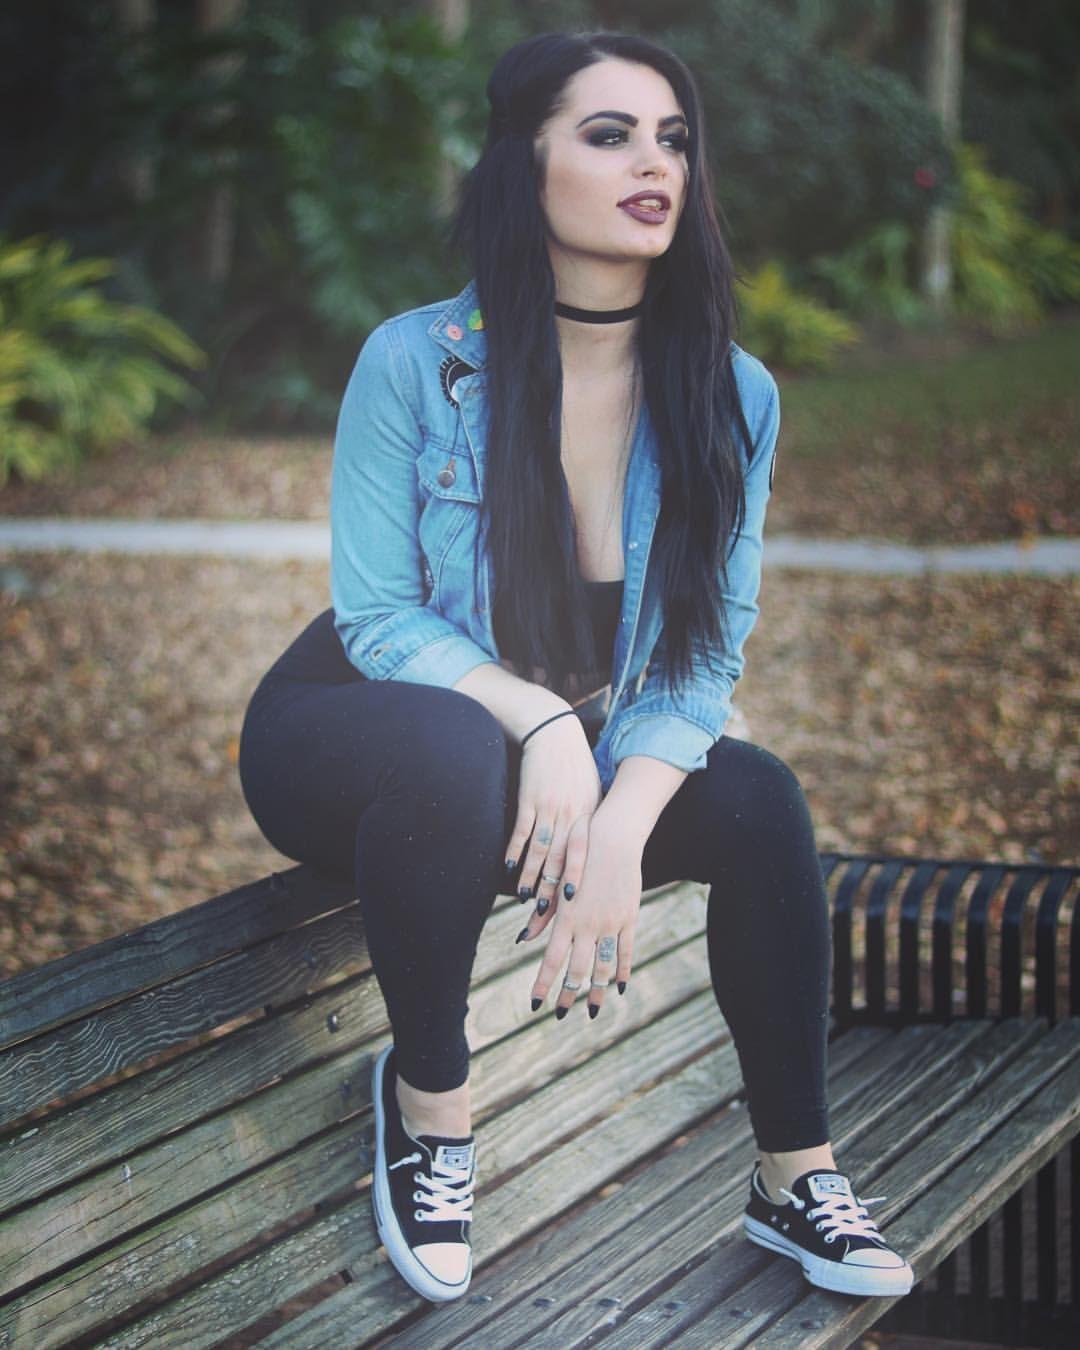 Instagram Saraya-Jade Rodriguez nude photos 2019